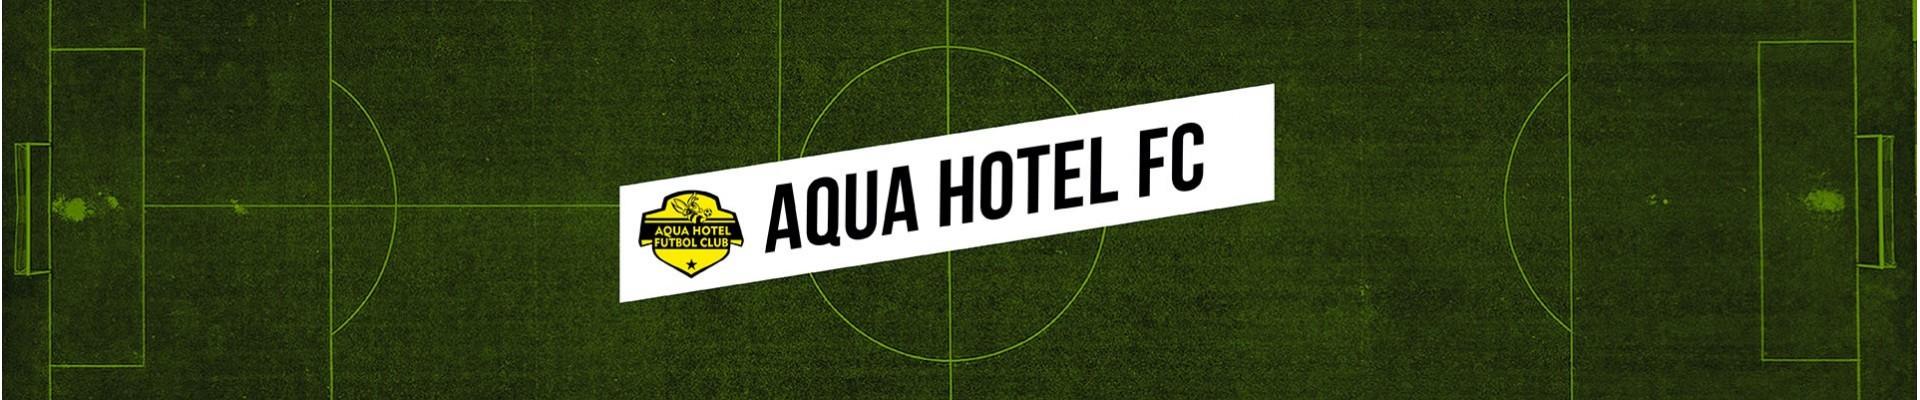 AQUAHOTEL FC